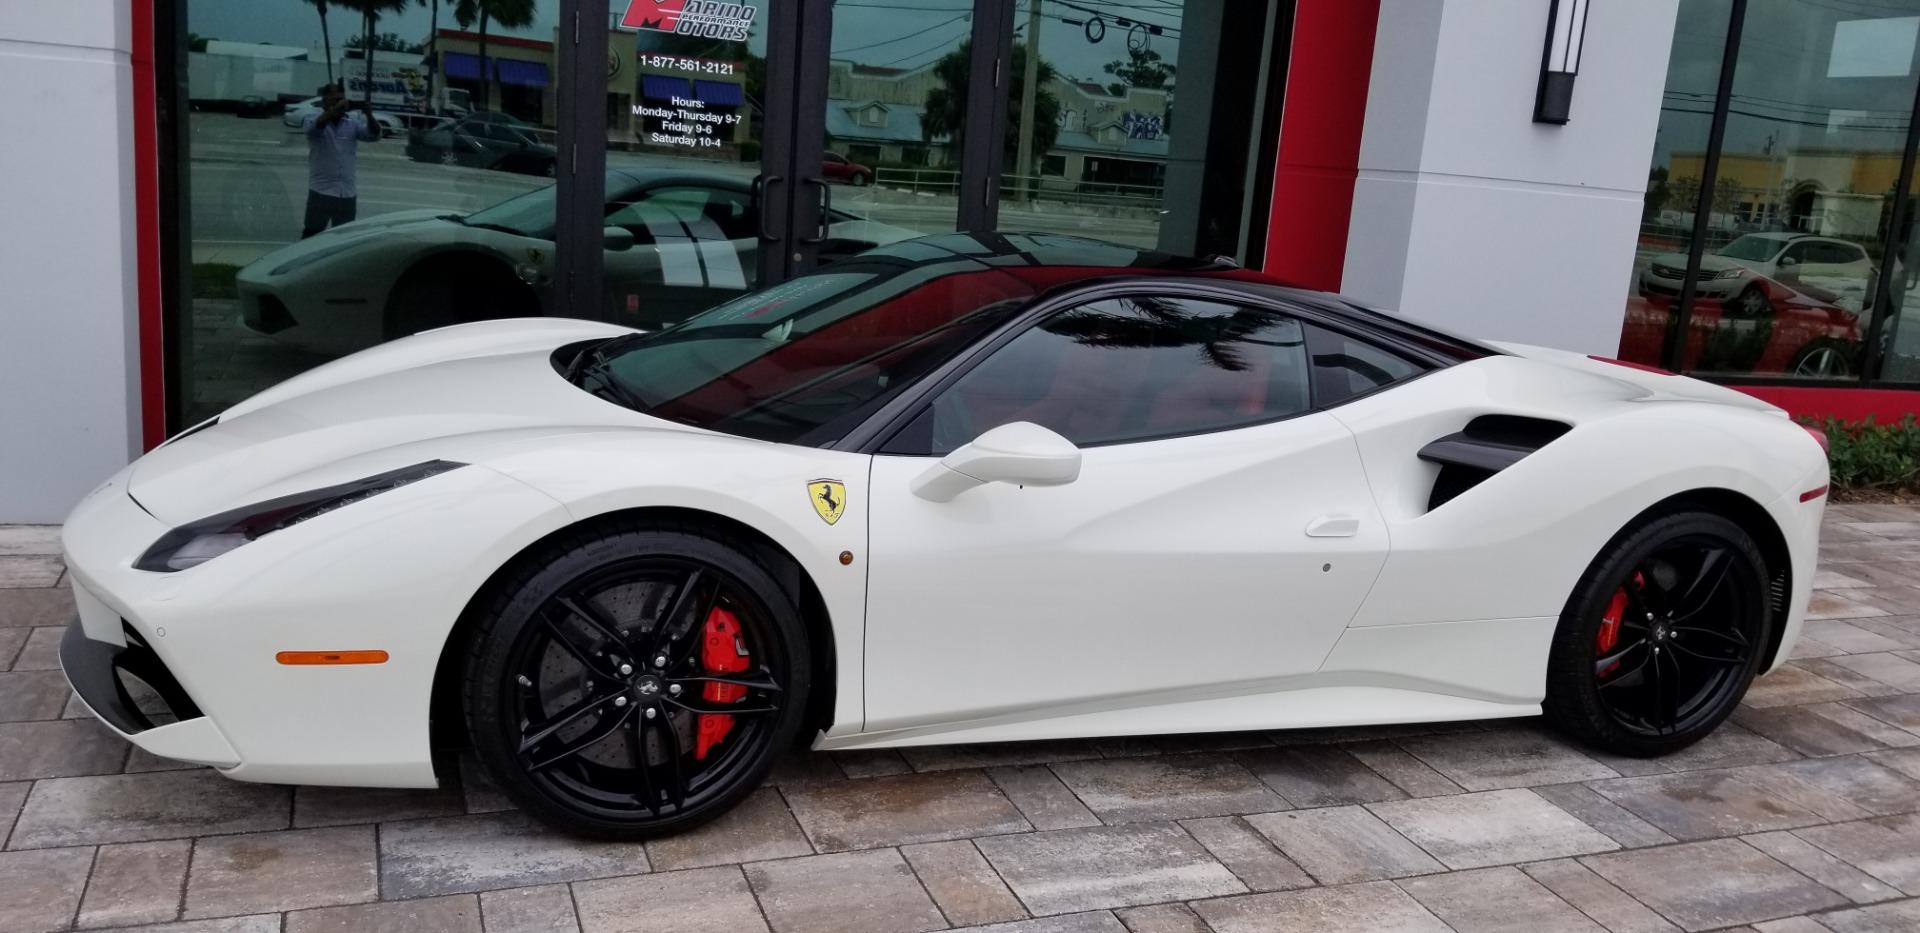 Used 2016 Ferrari 488 Gtb For Sale 309 900 Marino Performance Motors Stock G0214971